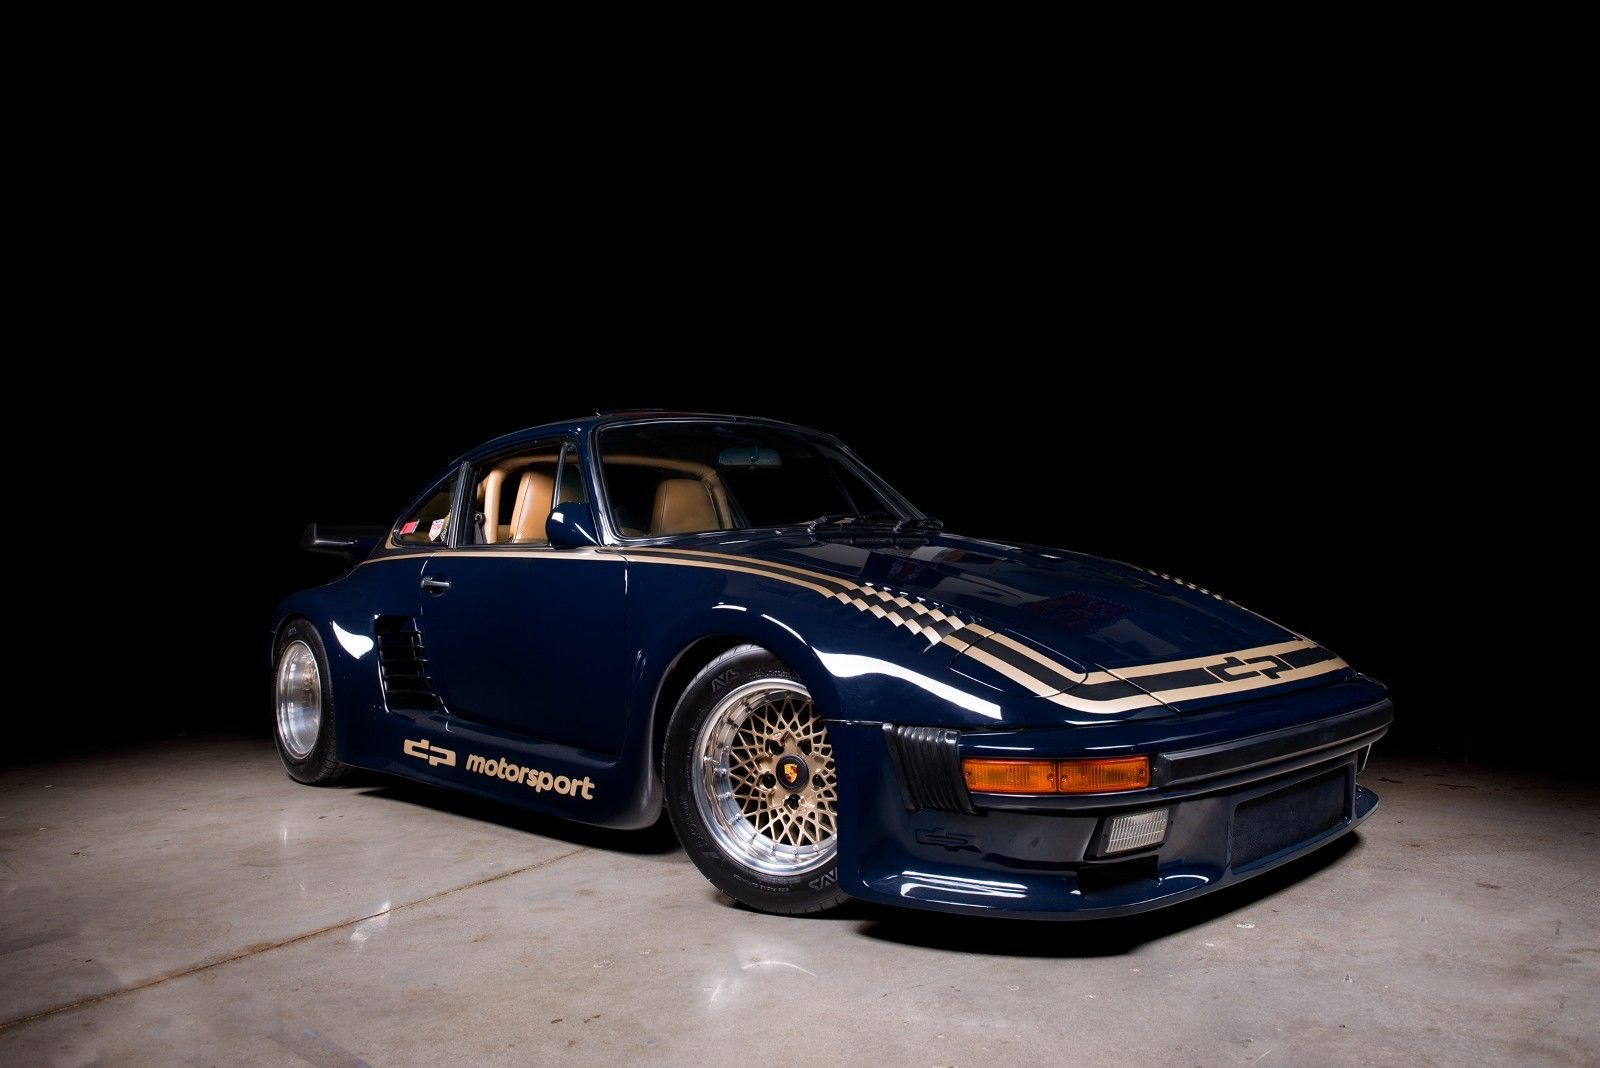 1985 Porsche 930 Turbo 935 DP Motorsports front 3/4